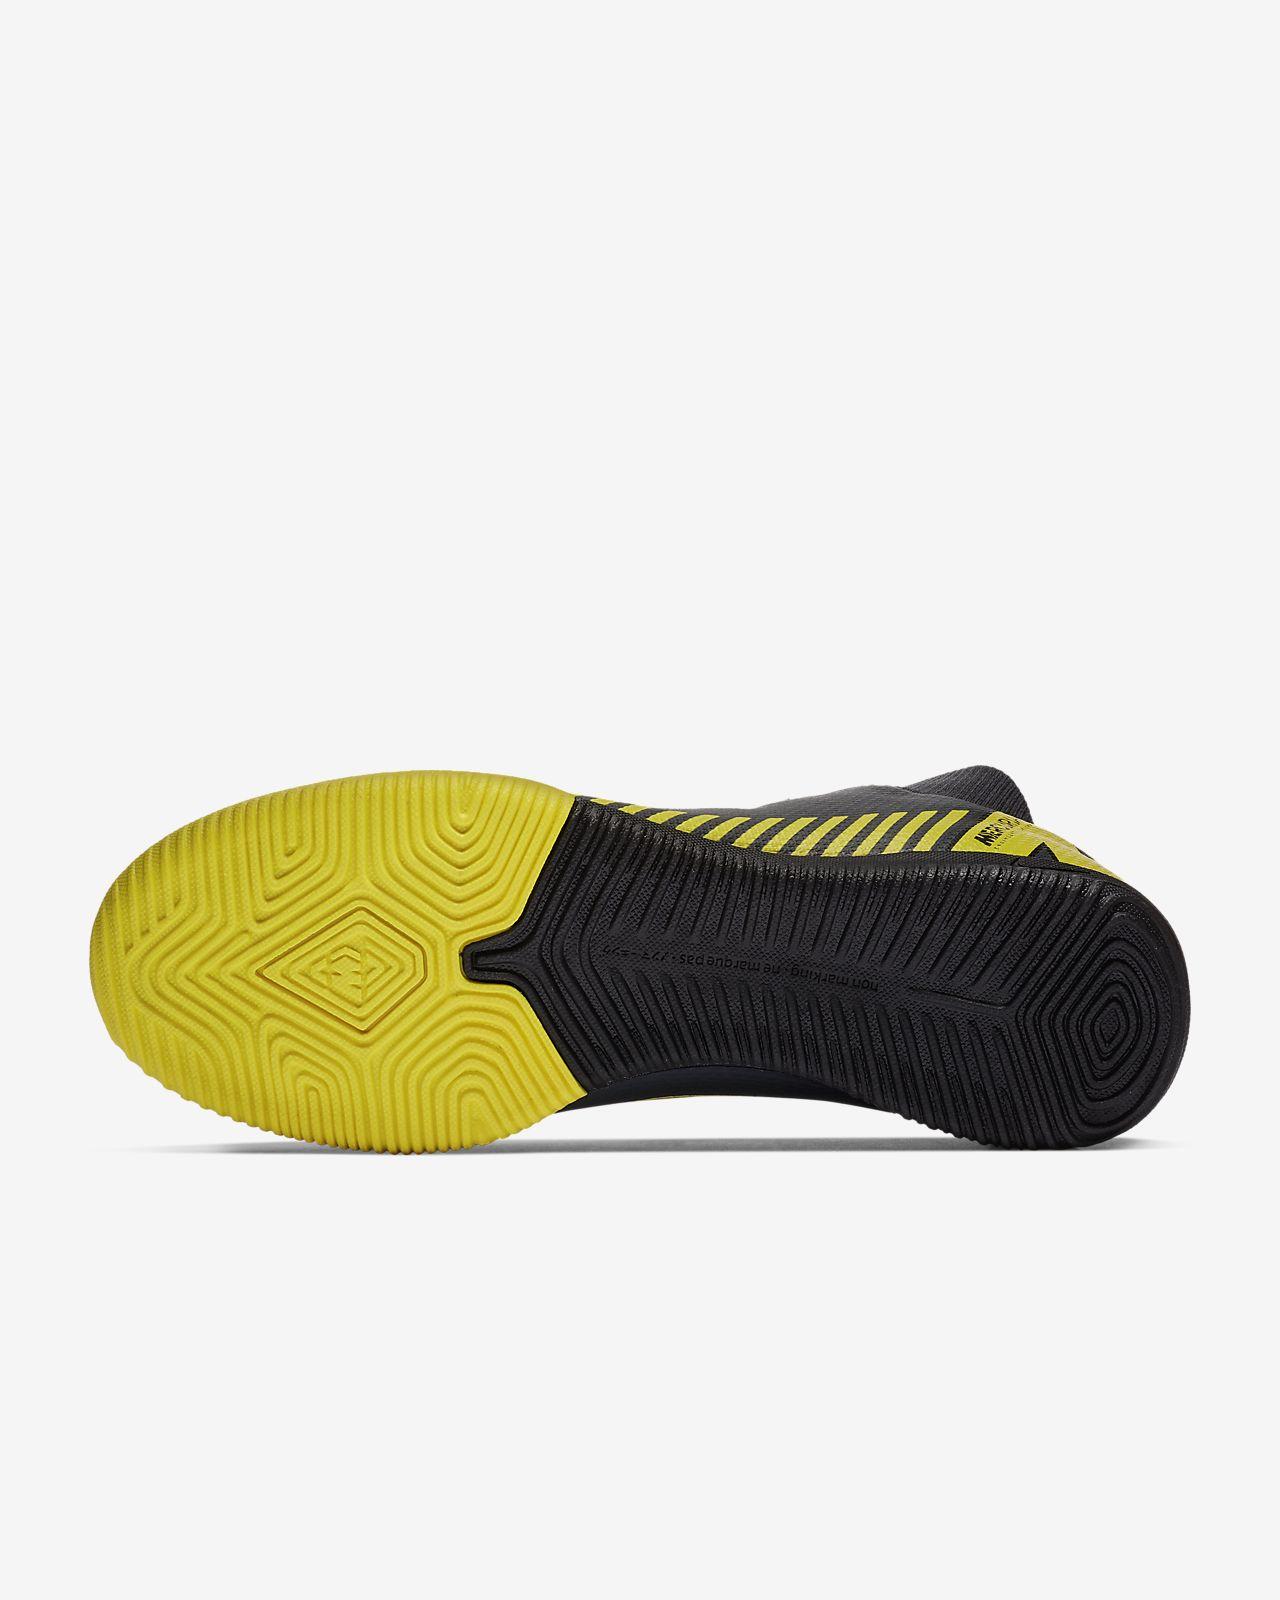 a055e5b66a4 Nike SuperflyX 6 Academy IC Indoor Court Football Boot. Nike.com AU